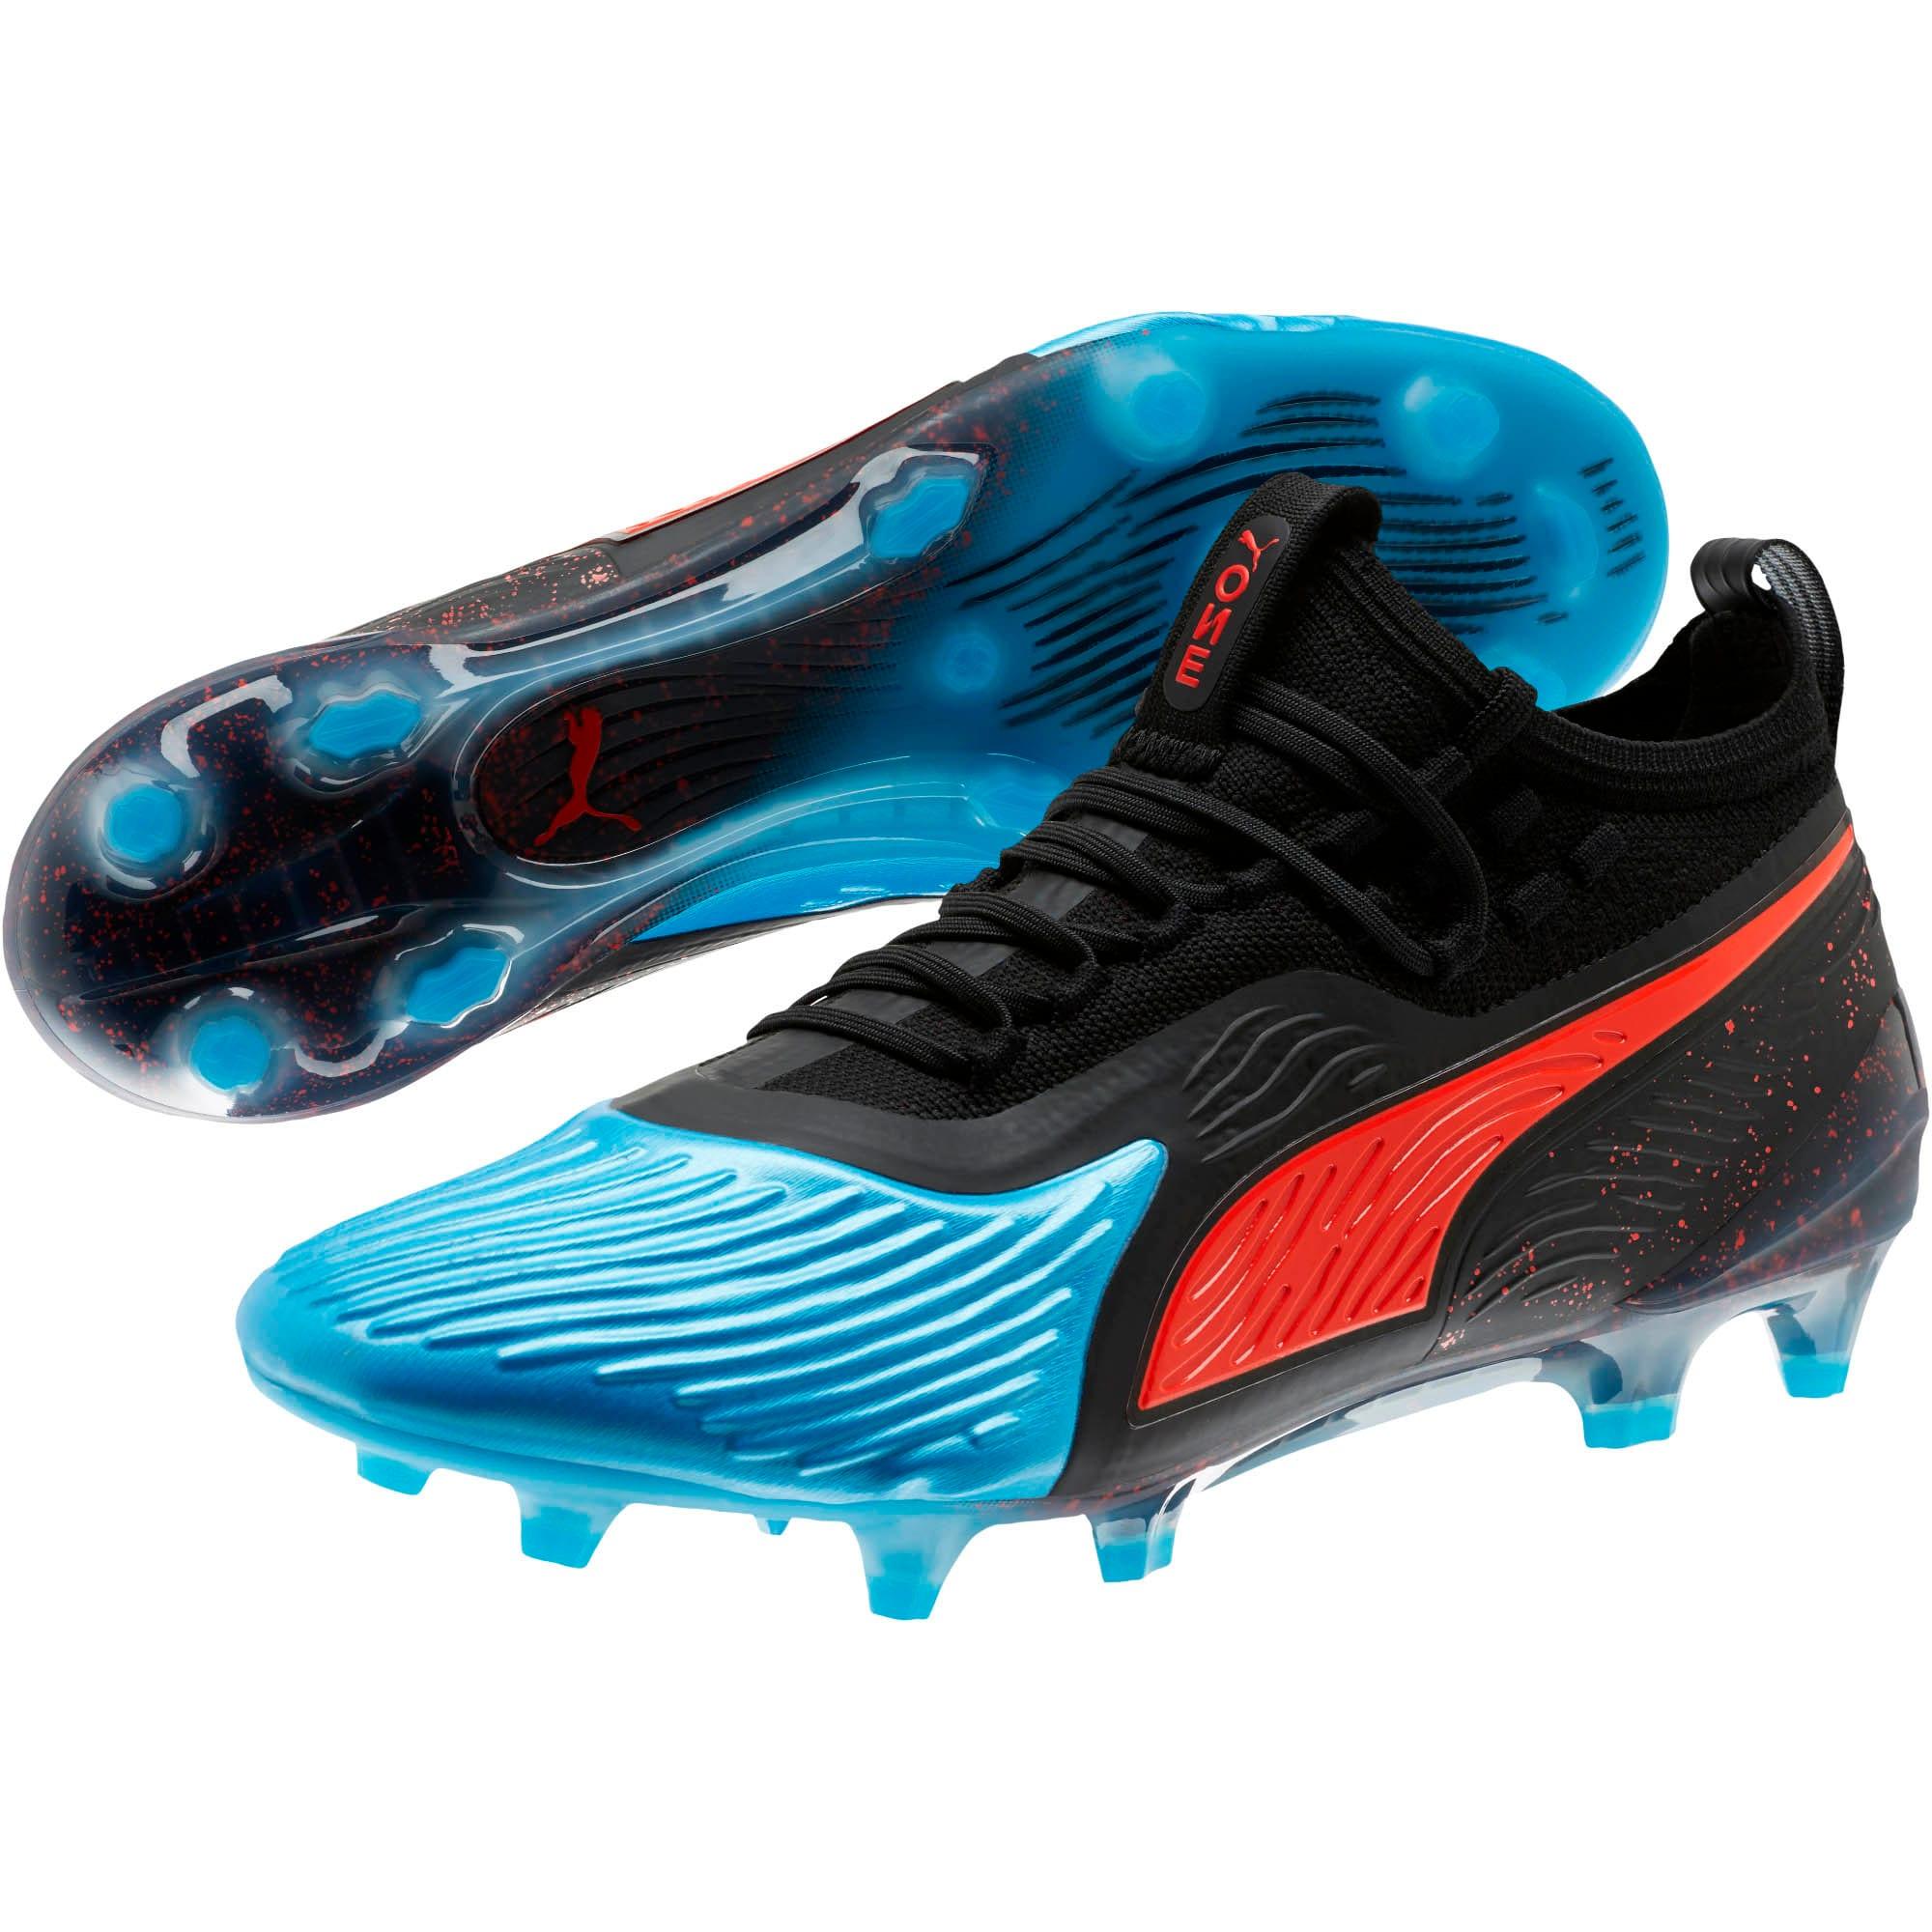 Thumbnail 2 of PUMA ONE 19.1 FG/AG Men's Soccer Cleats, Bleu Azur-Red Blast-Black, medium